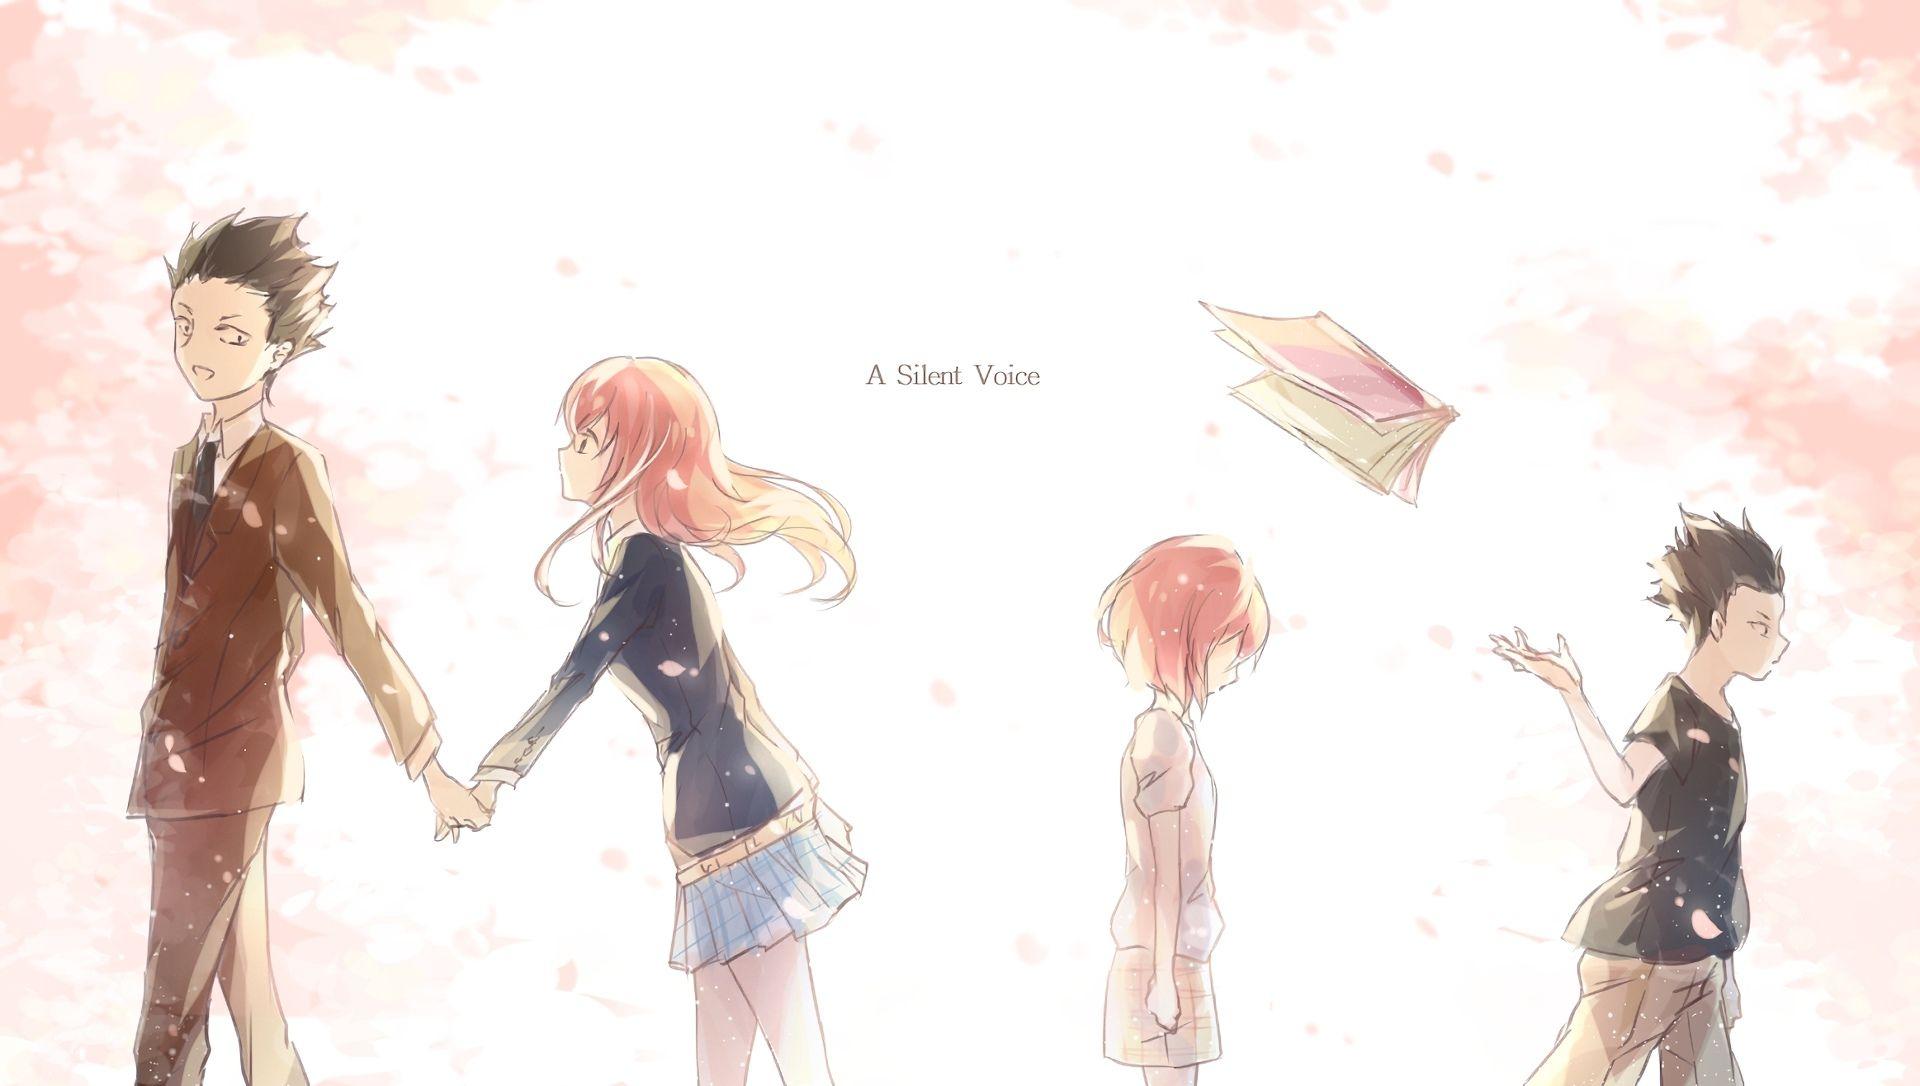 Anime Koe No Katachi Wallpaper Filmes de anime, Anime